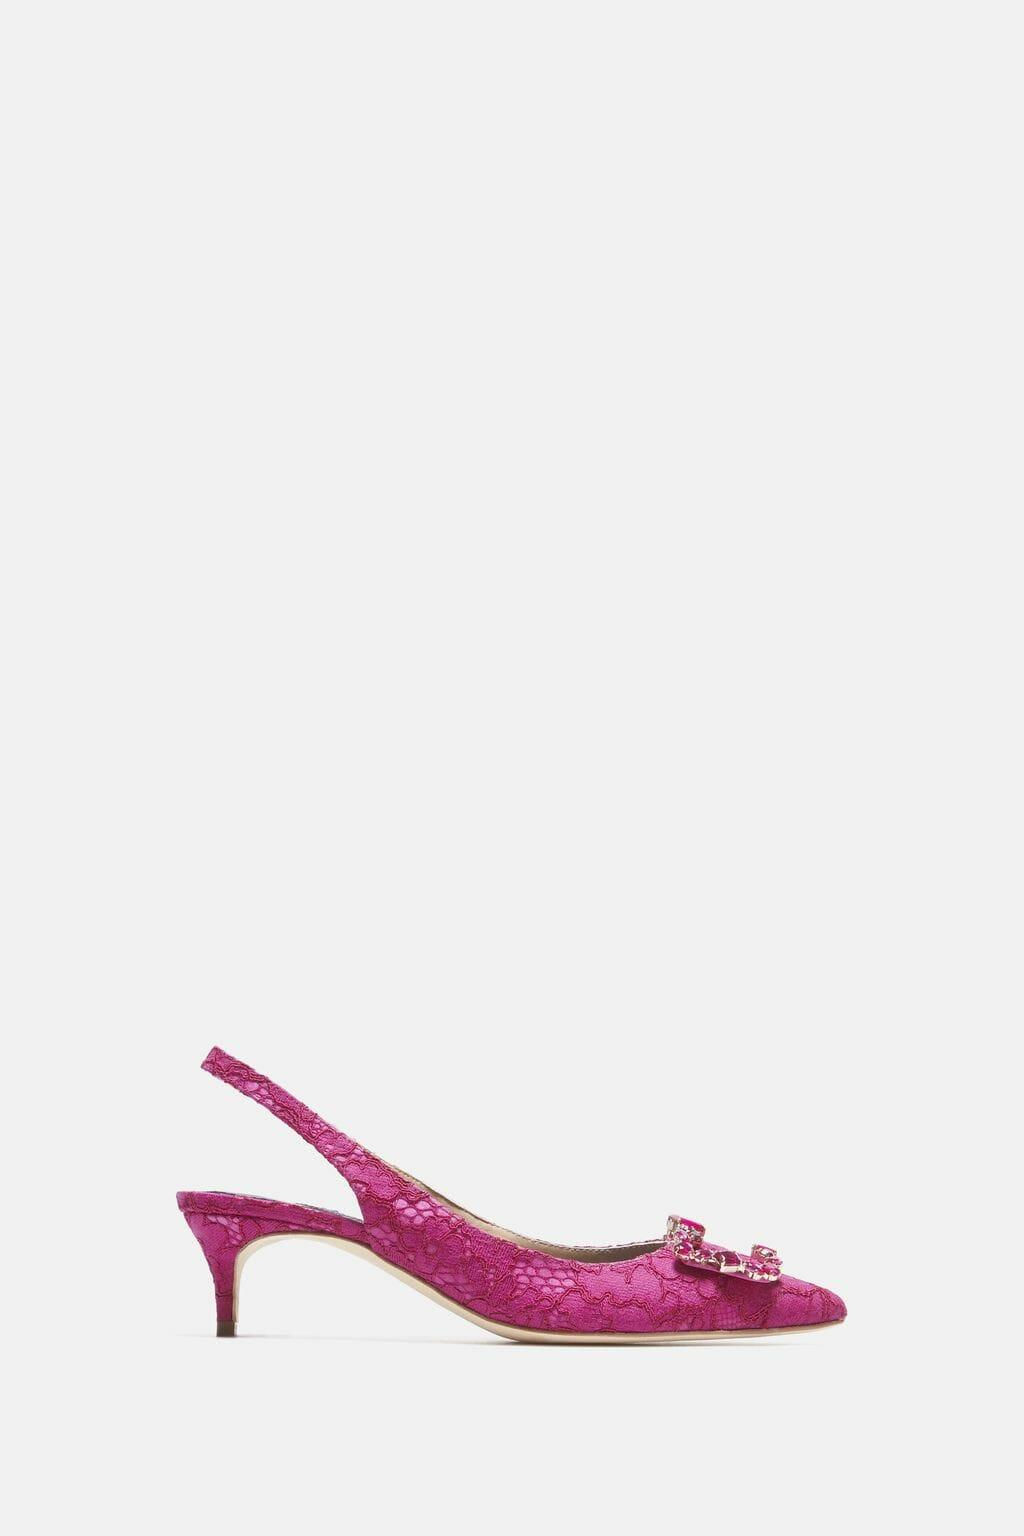 CH-Carolina-herrera-shoes-collection-Spring-Summer-2018-shoe-25